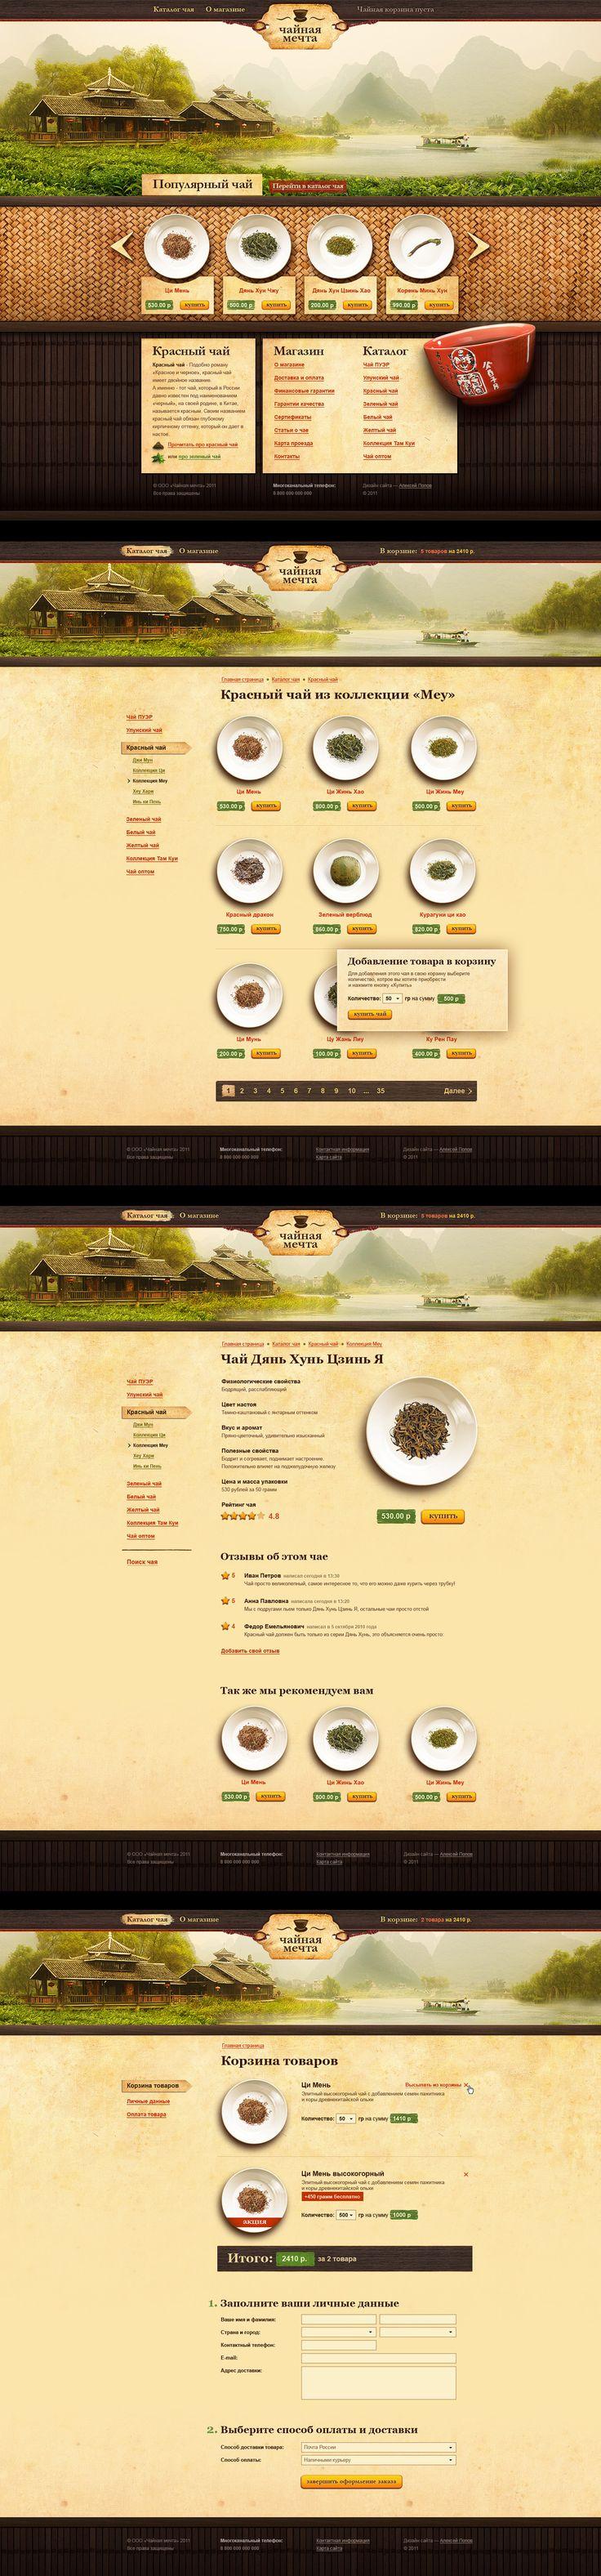 nice #webdesign #design | #webdesign #it #web #design #layout #userinterface #website #webdesign <<< repinned by an #advertising #agency from #Hamburg / #Germany - www.BlickeDeeler.de | Follow us on www.facebook.com/BlickeDeeler